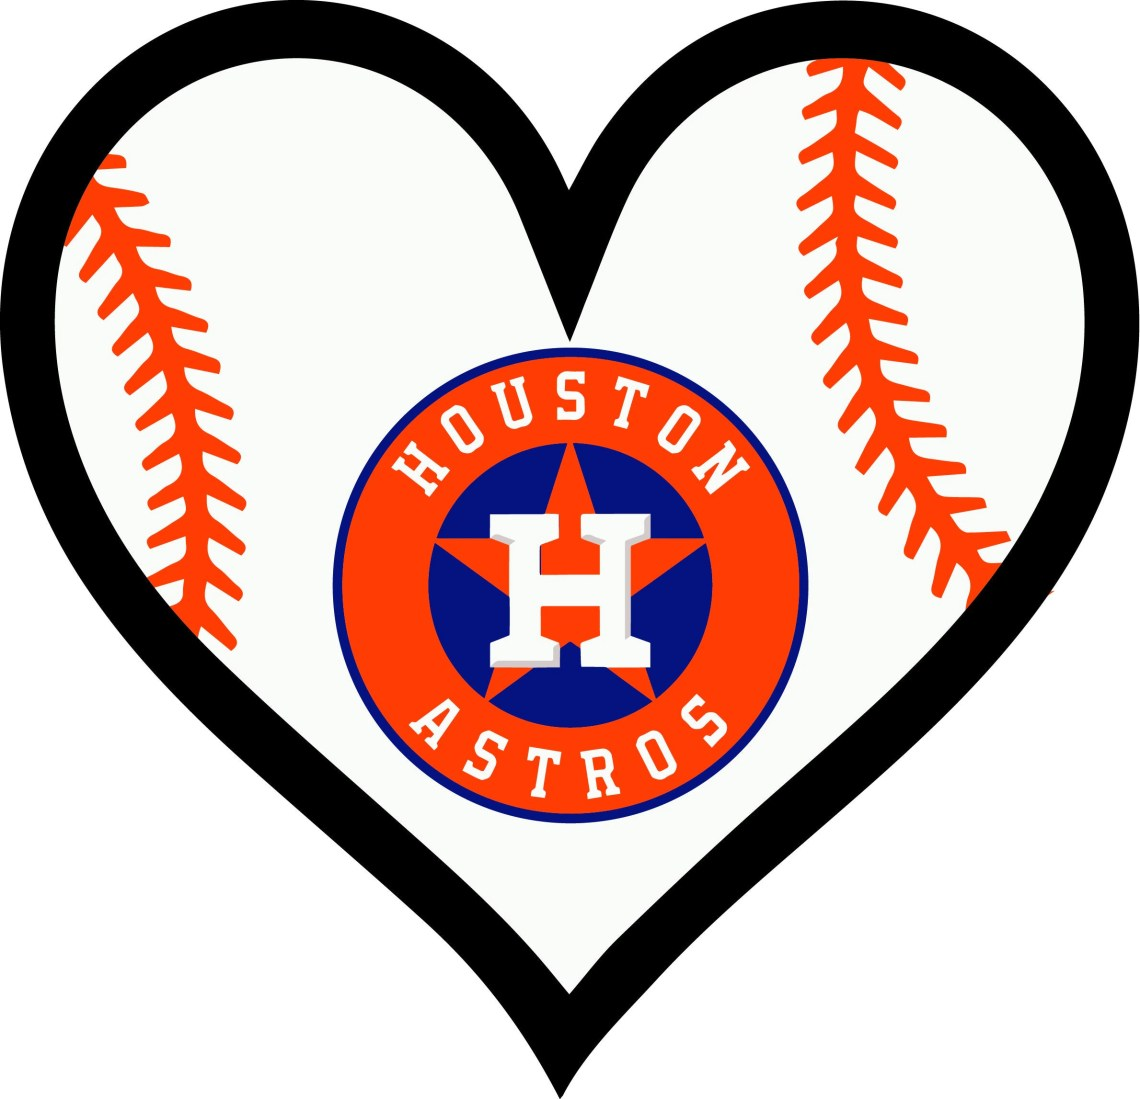 Download Houston Astros Texas Baseball l Love Heart digital for decal